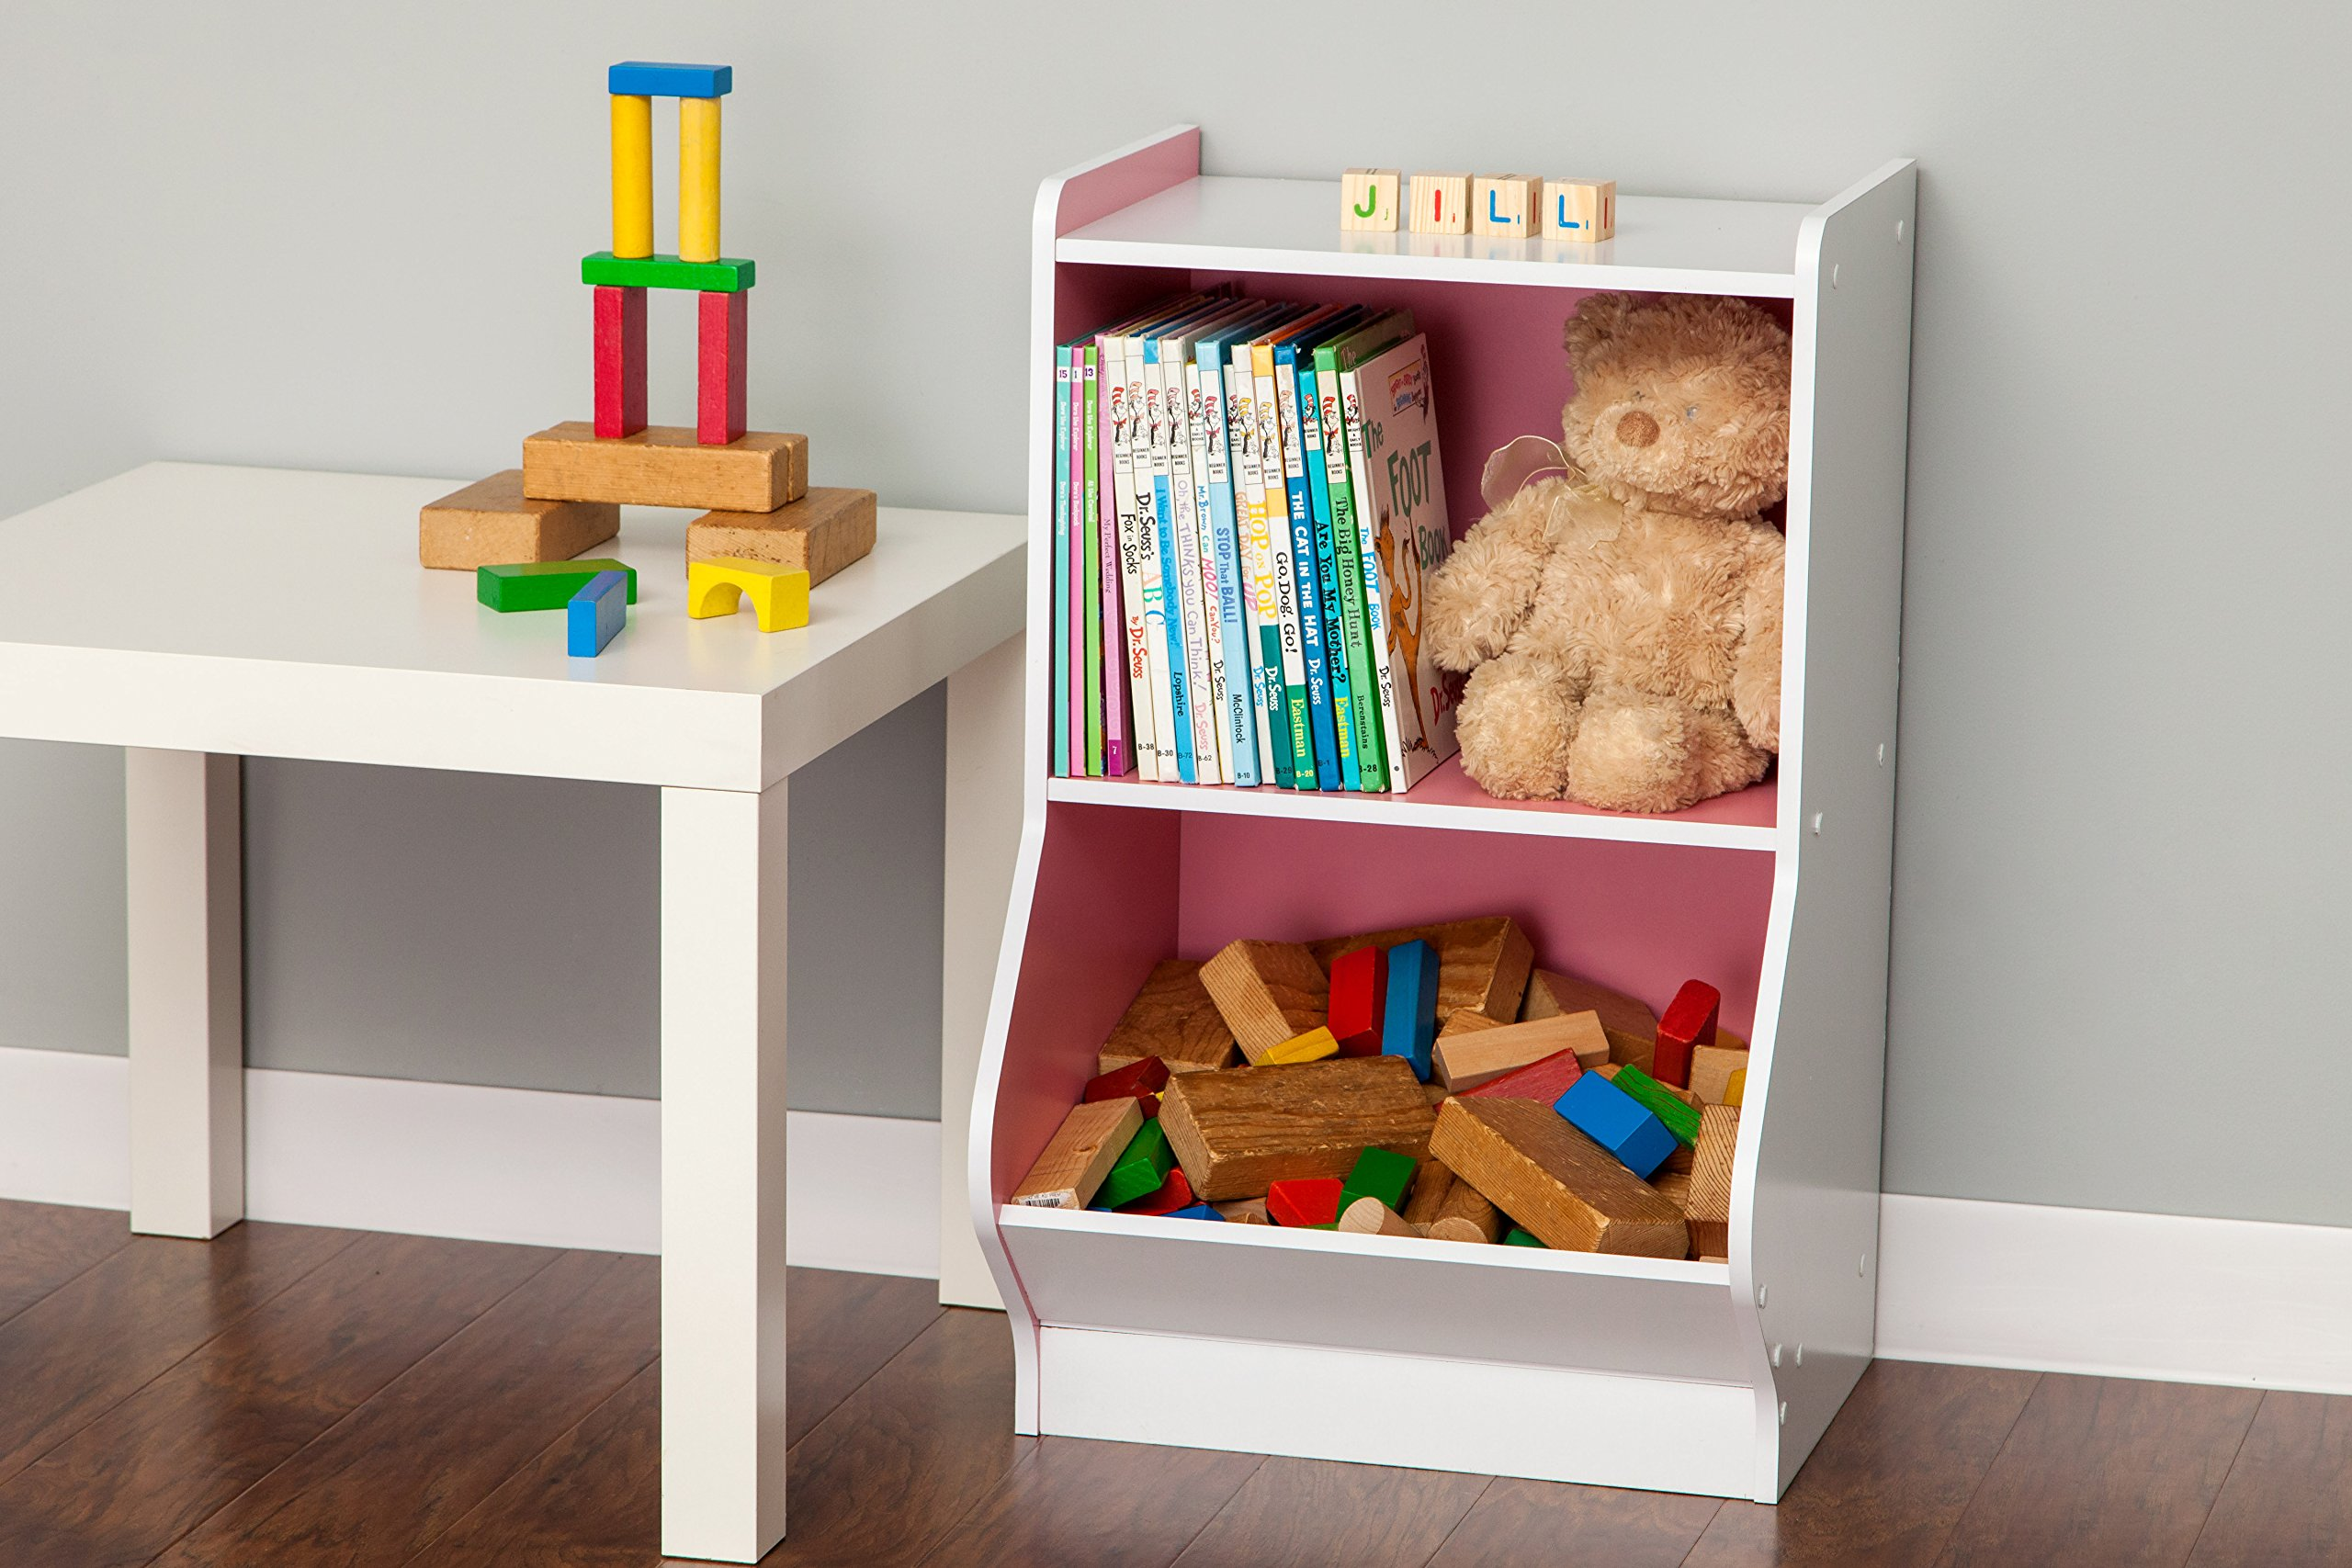 IRIS 2-Tier Storage Organizer Shelf with Footboard, White and Pink by IRIS USA, Inc. (Image #4)